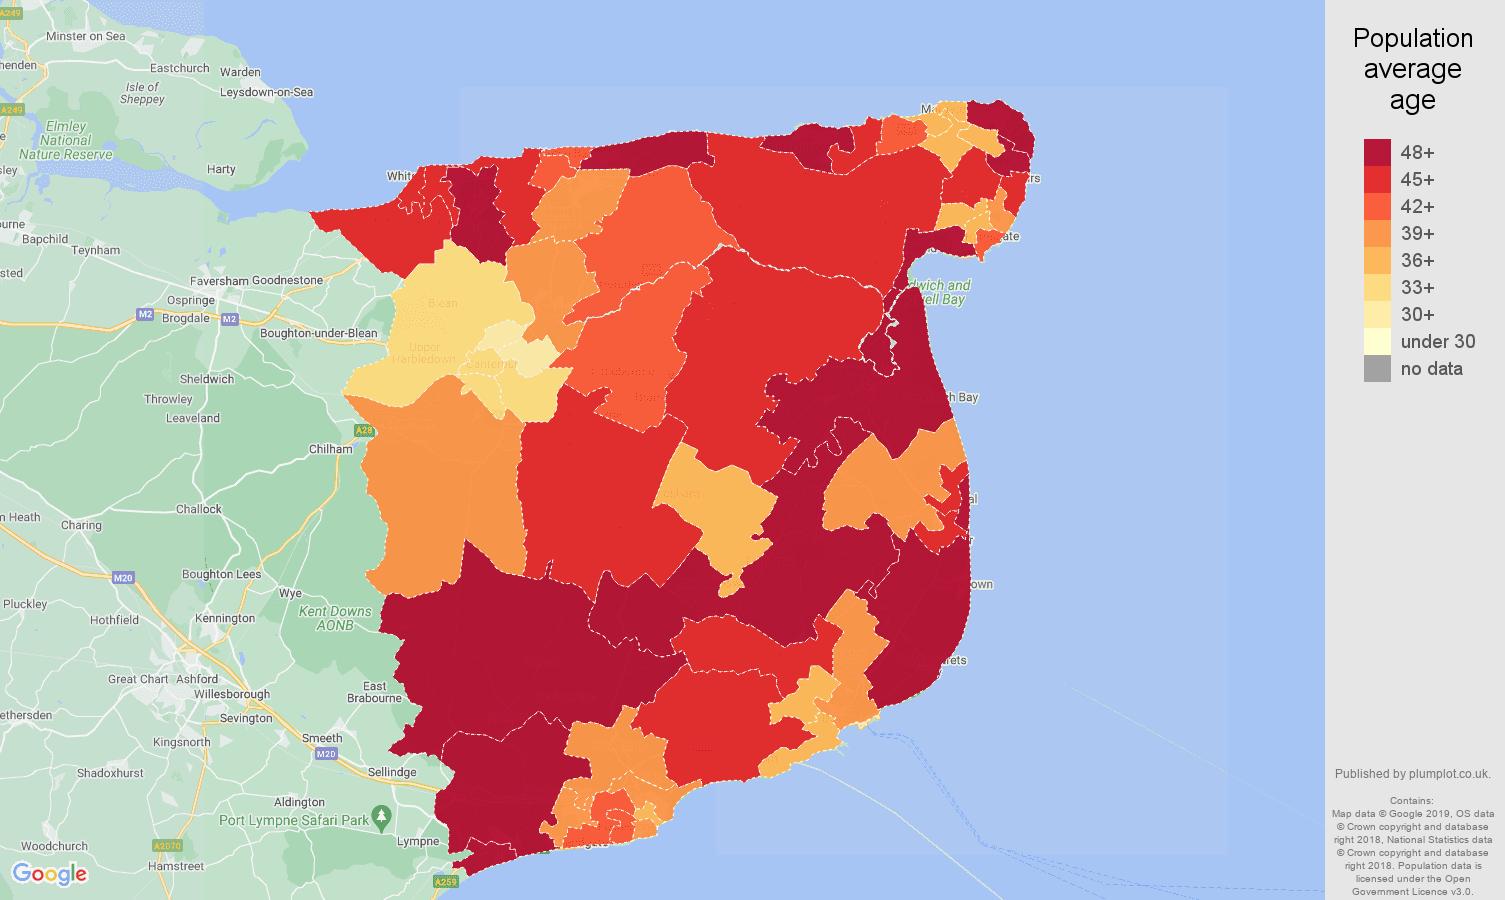 Canterbury population average age map